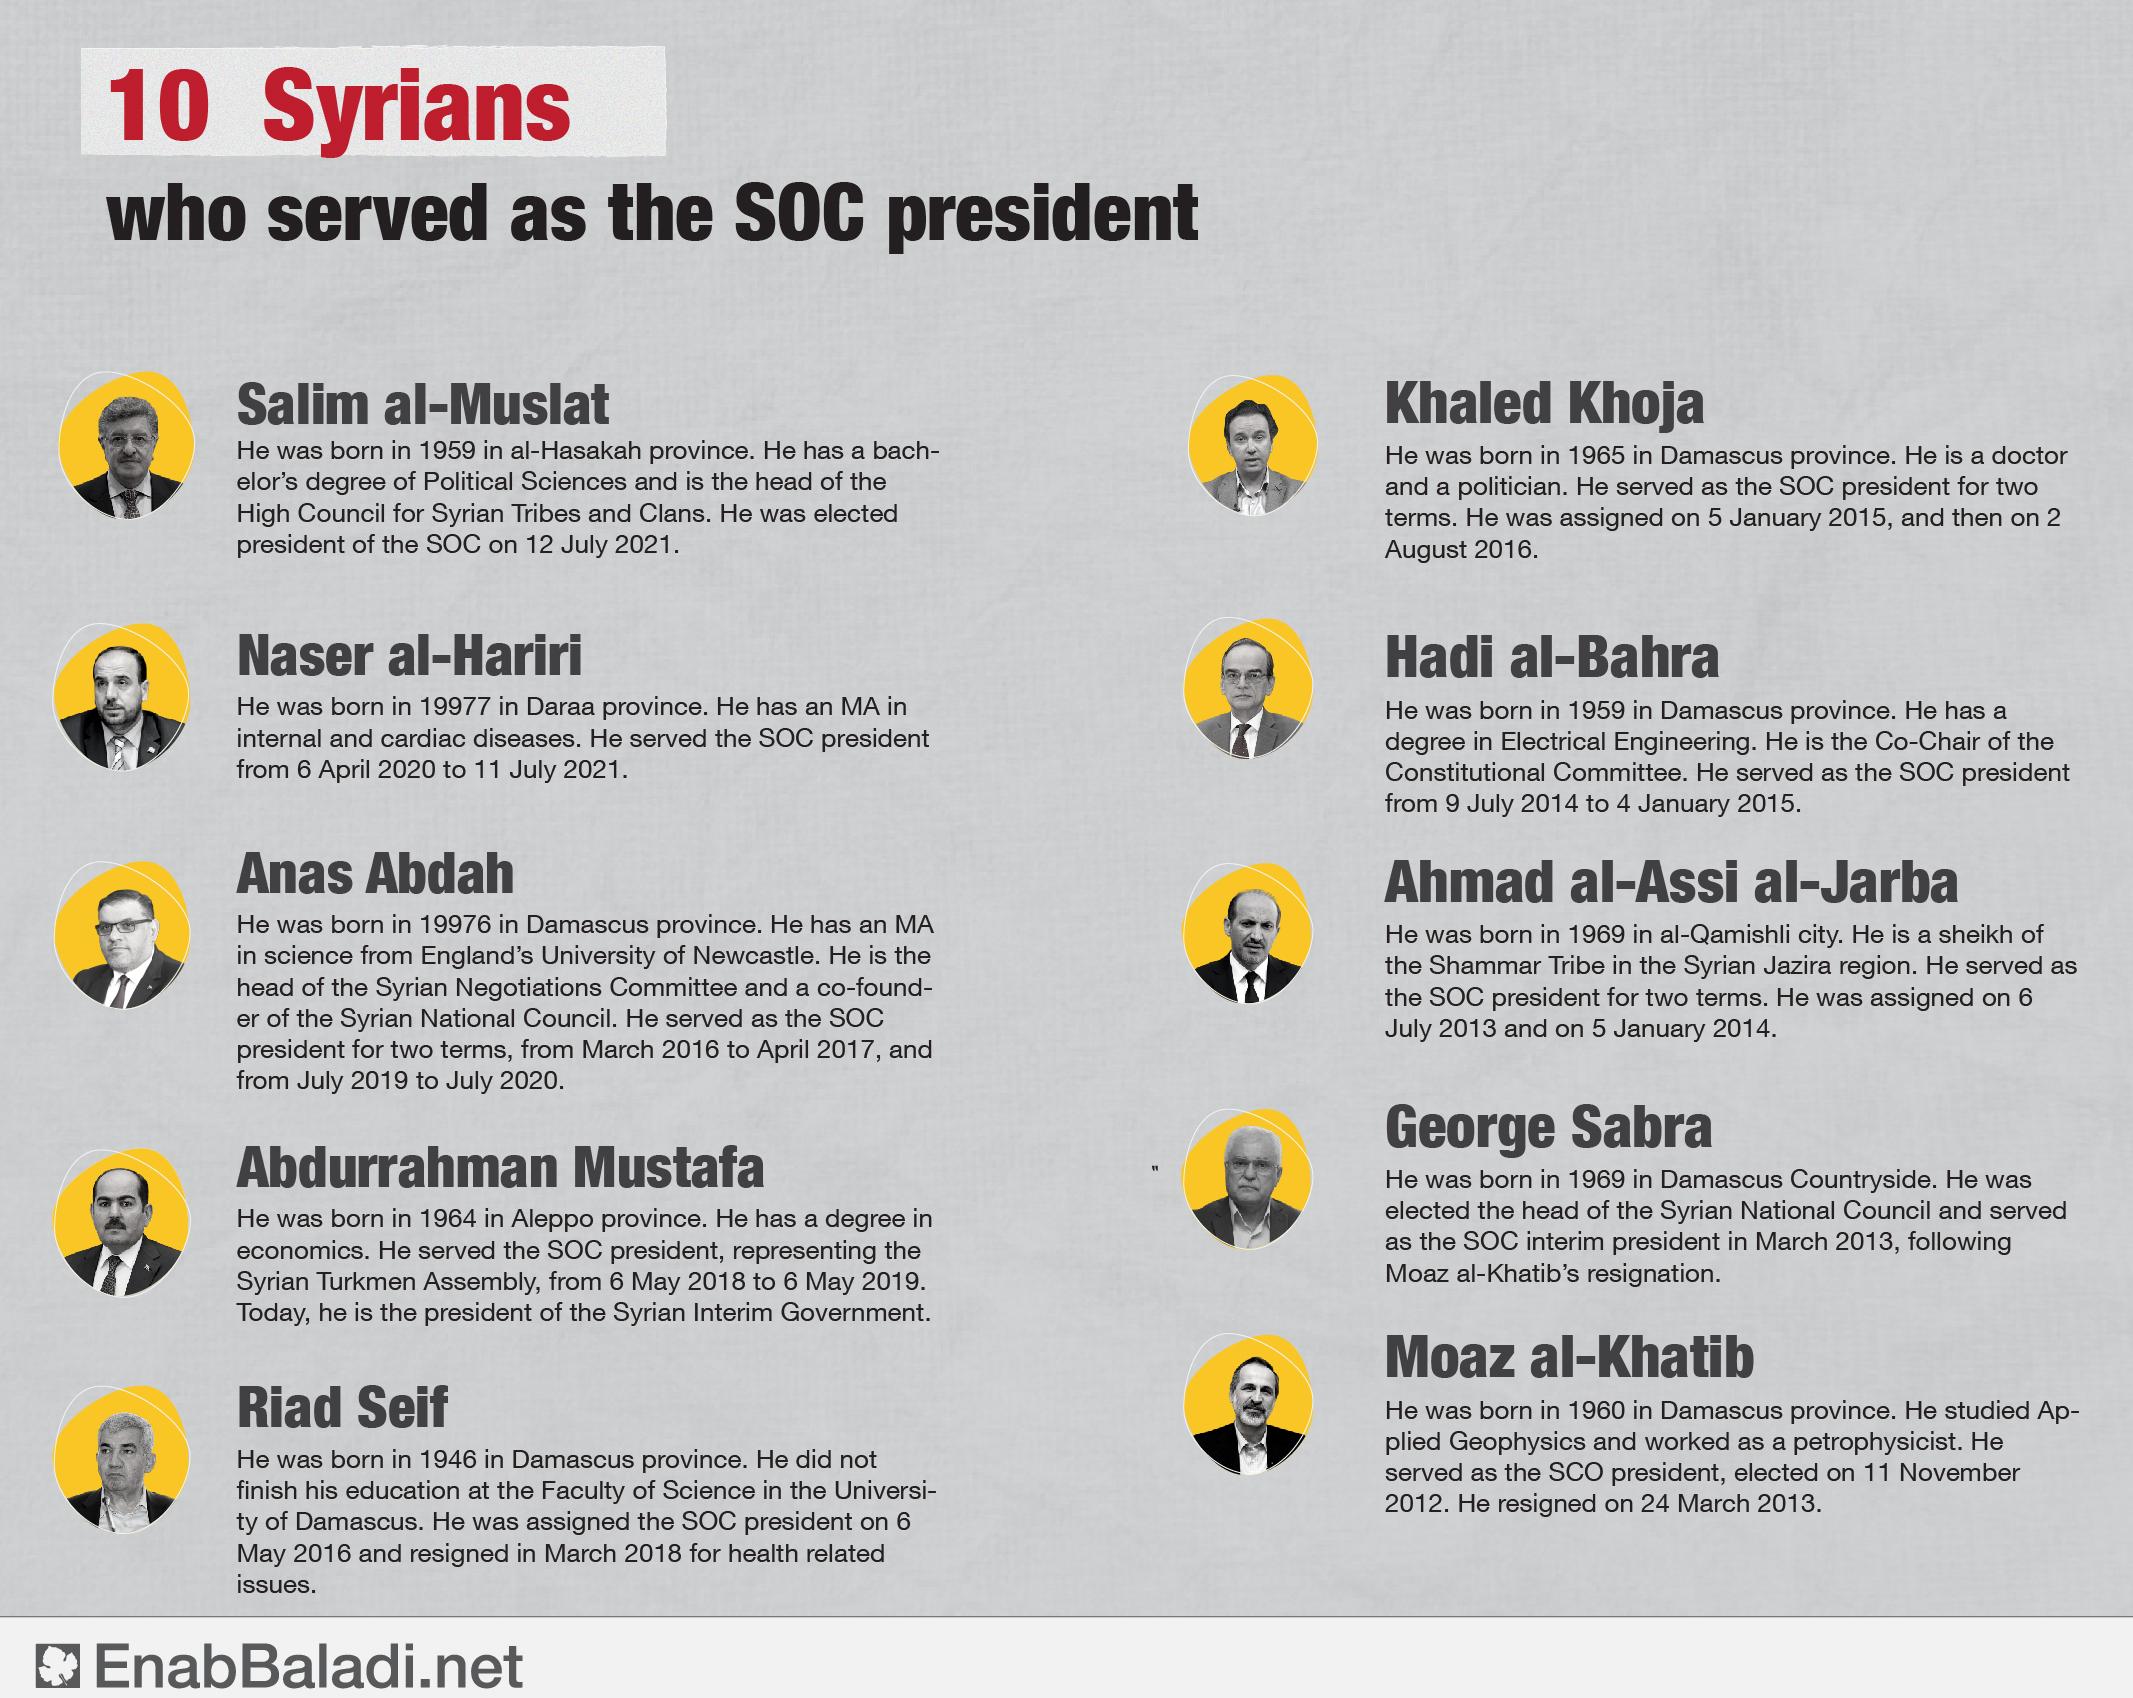 Ten Syrian personalities elected as SOC presidents.